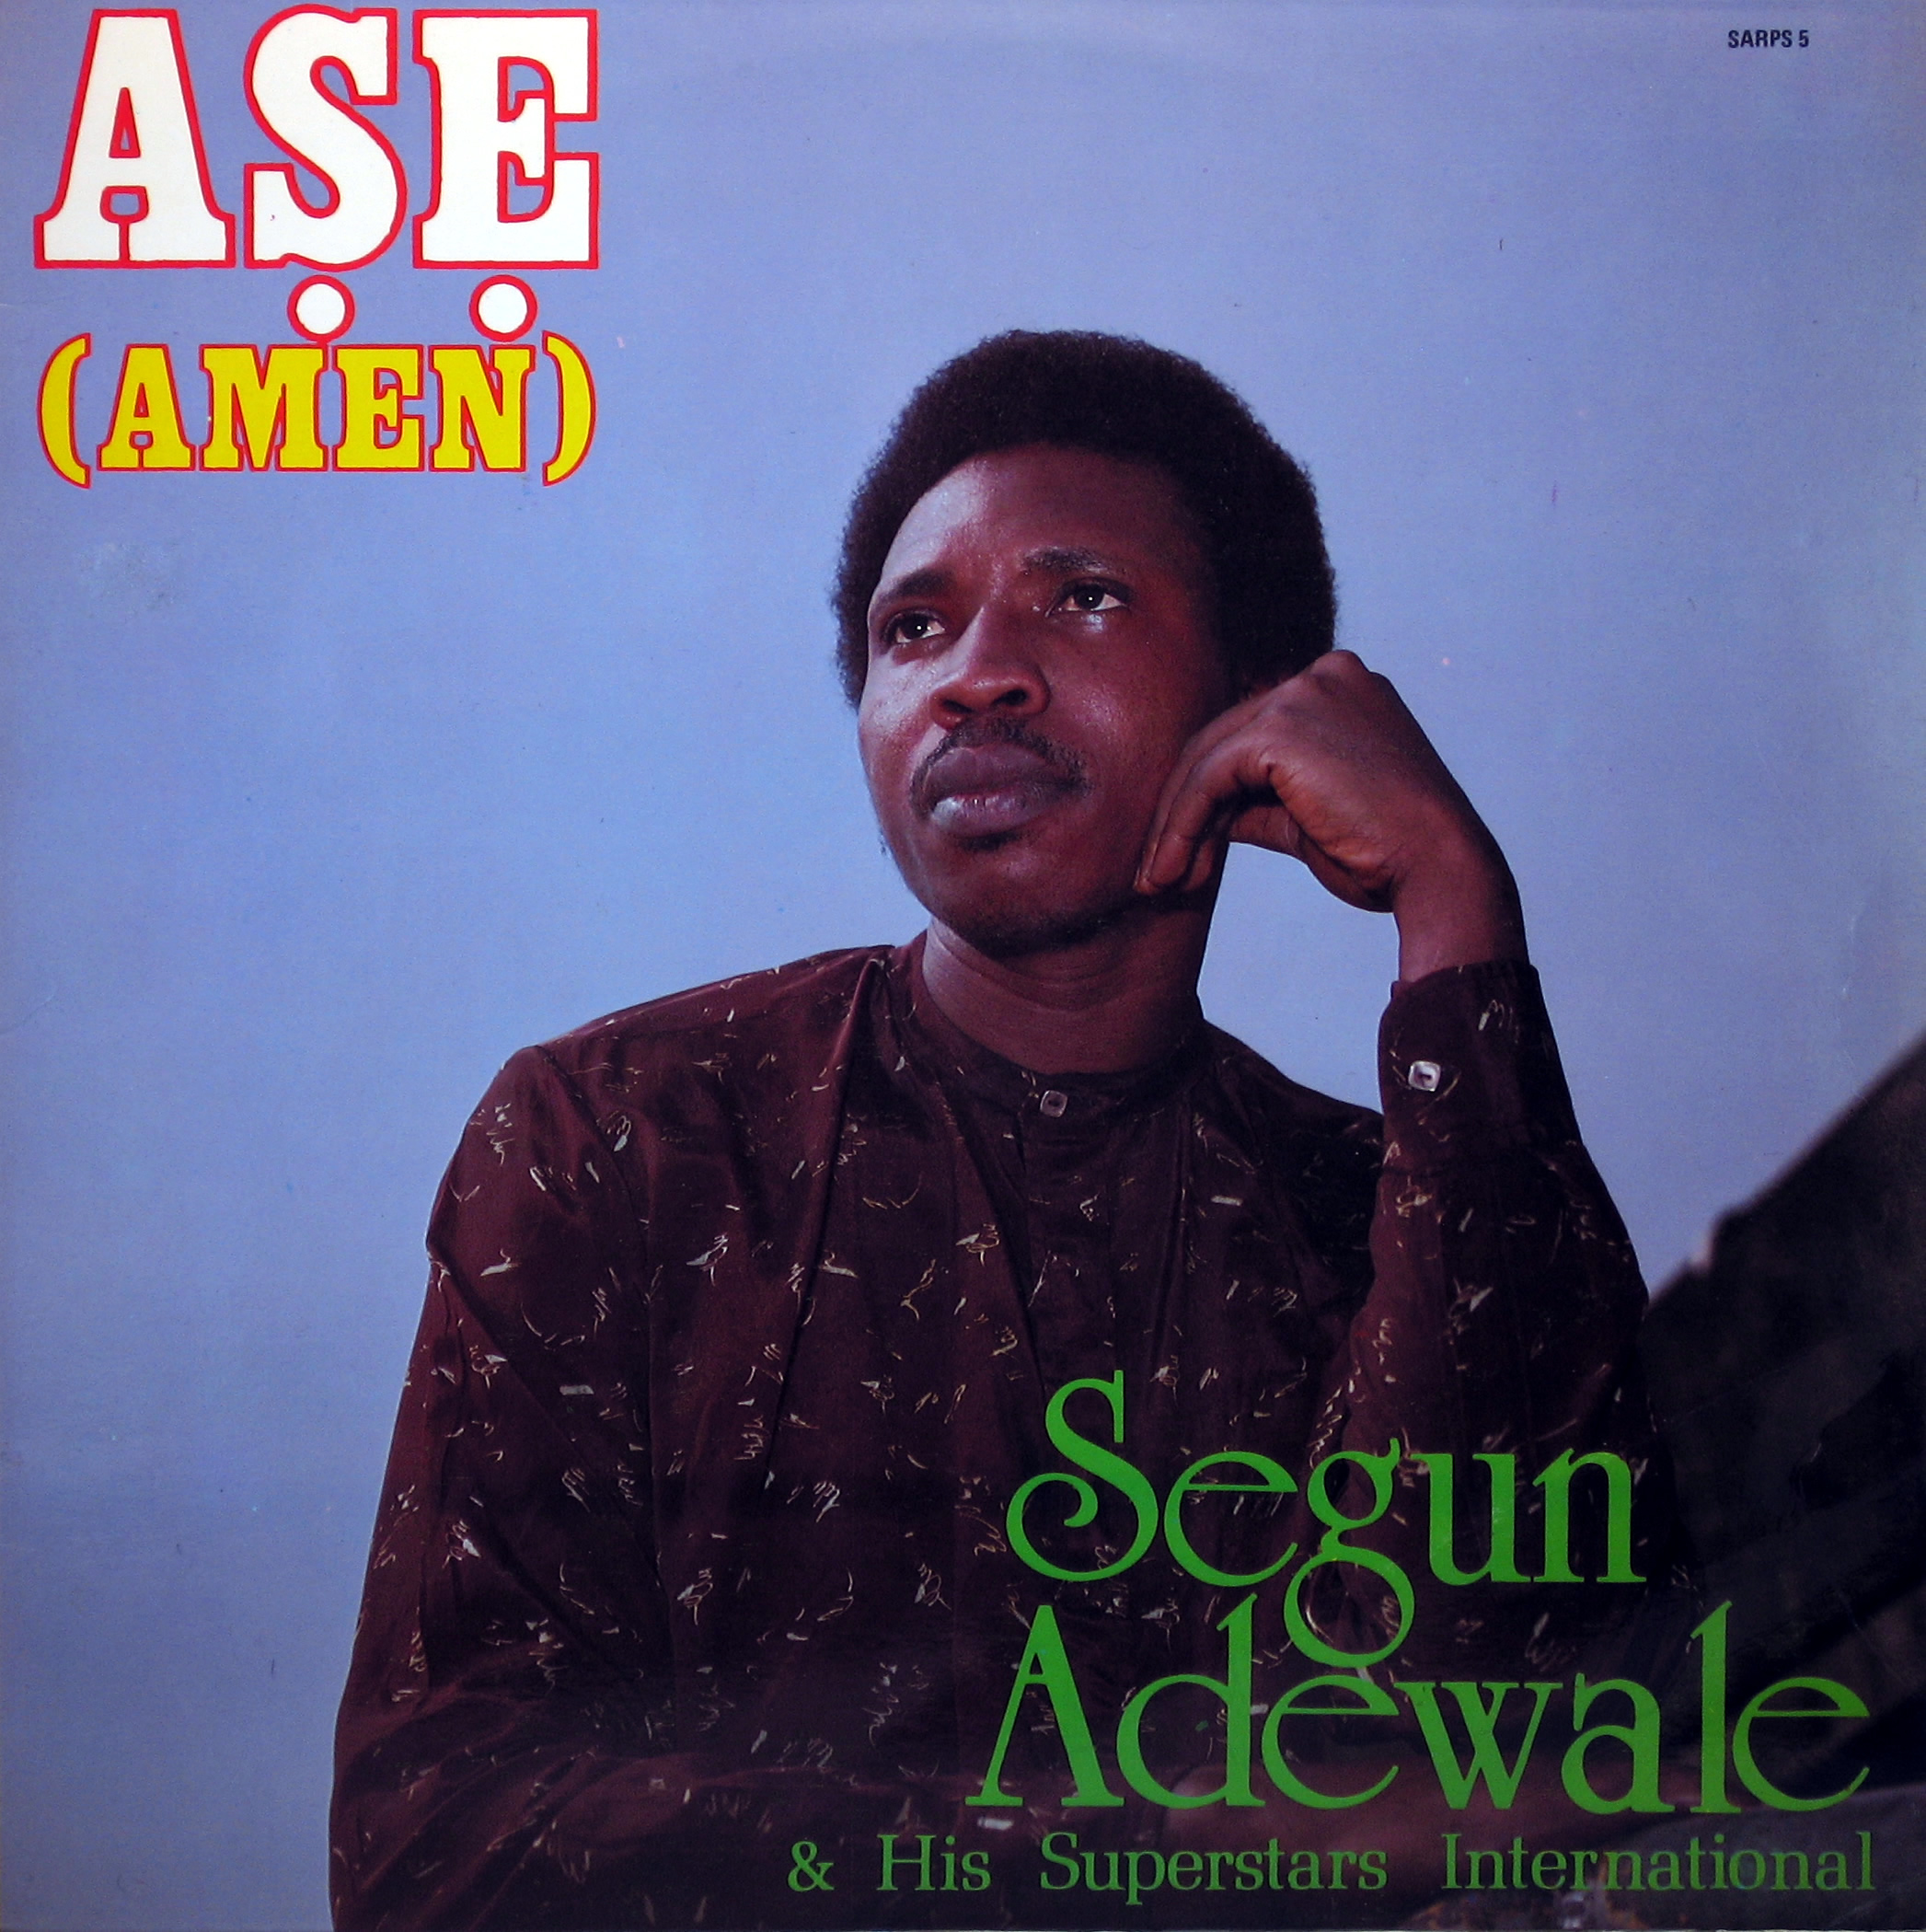 Segun Adewale & His Superstars International – Aṣẹ (Amen) 80s NIGERIAN Yoruba/Juju Music ALBUM LP